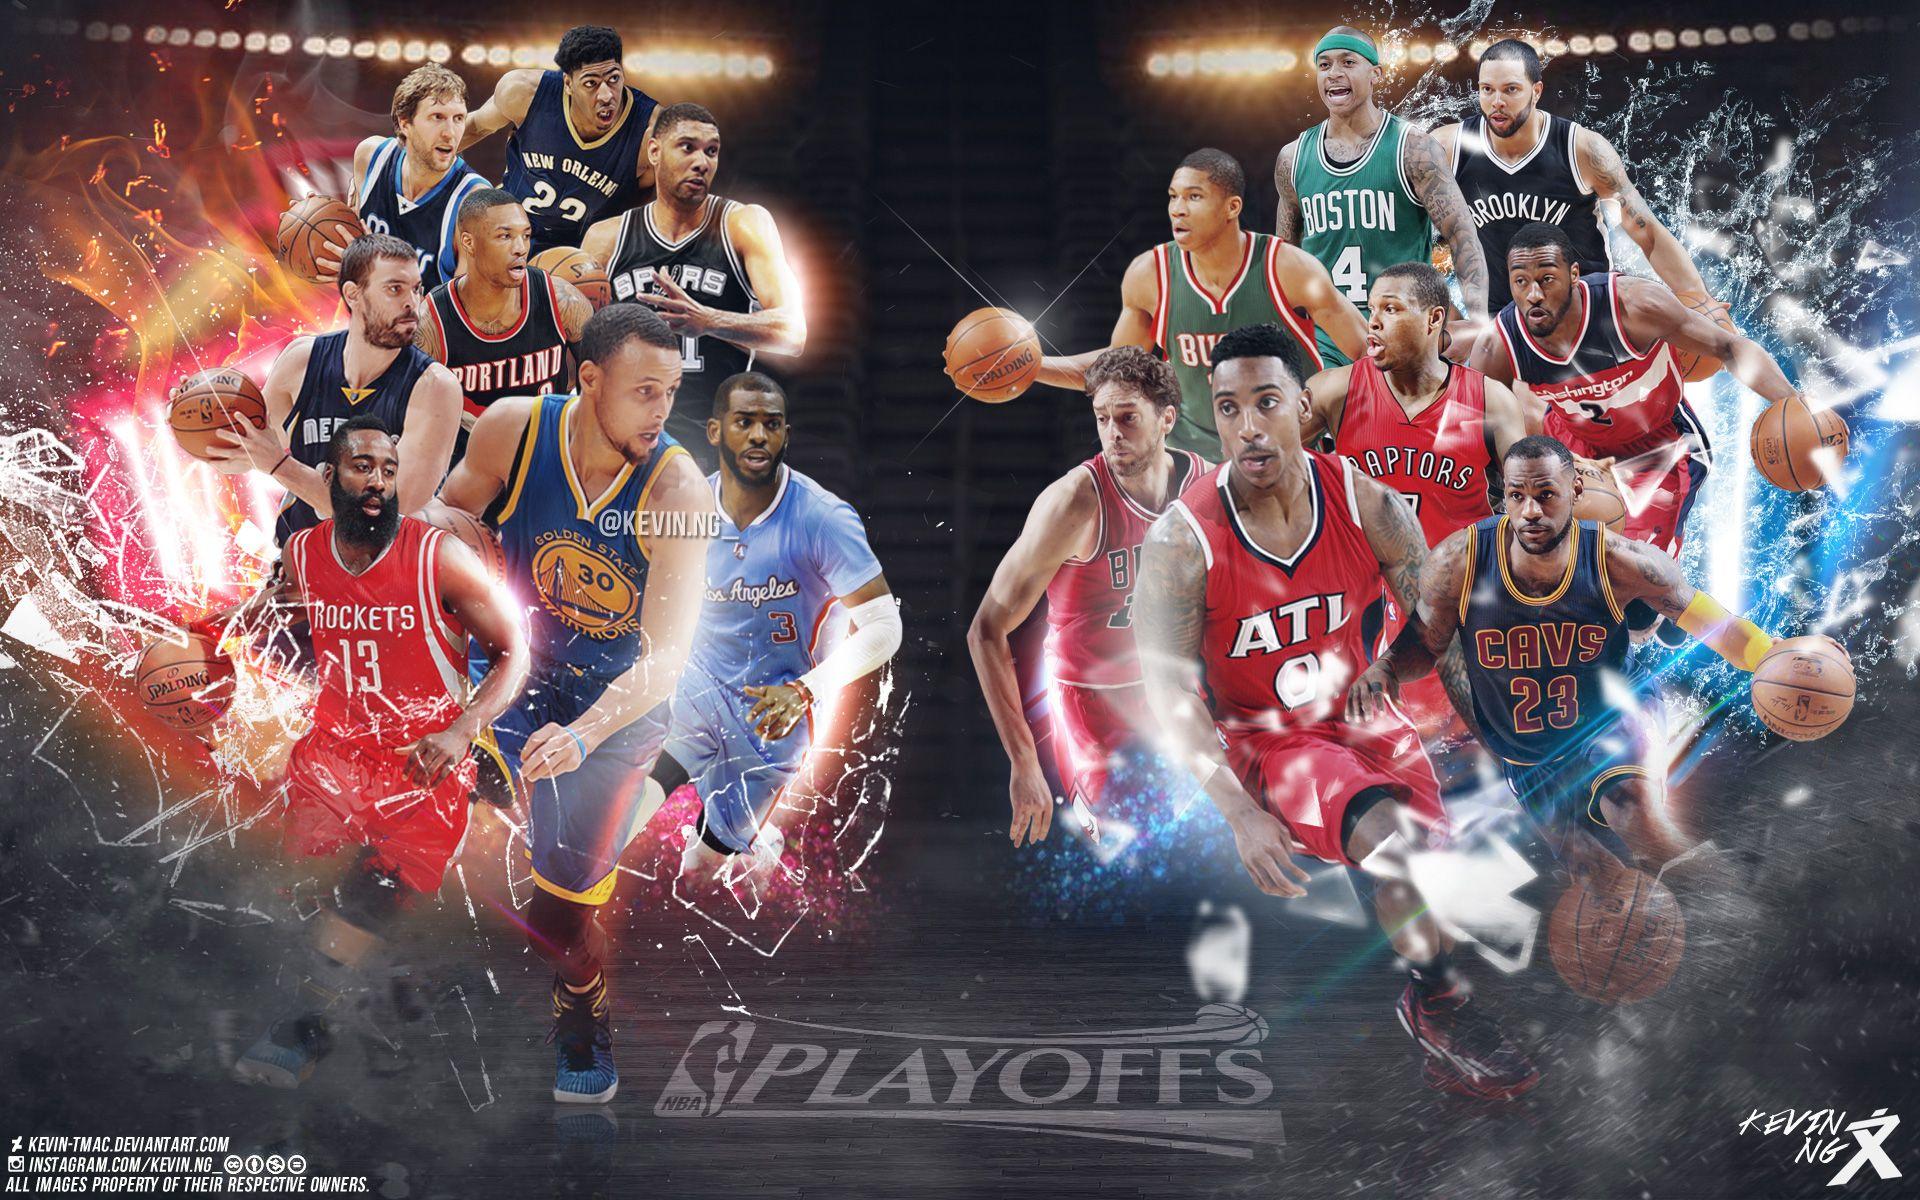 Allstars Teams Nba Wallpapers Basketball Wallpaper Nba Playoffs